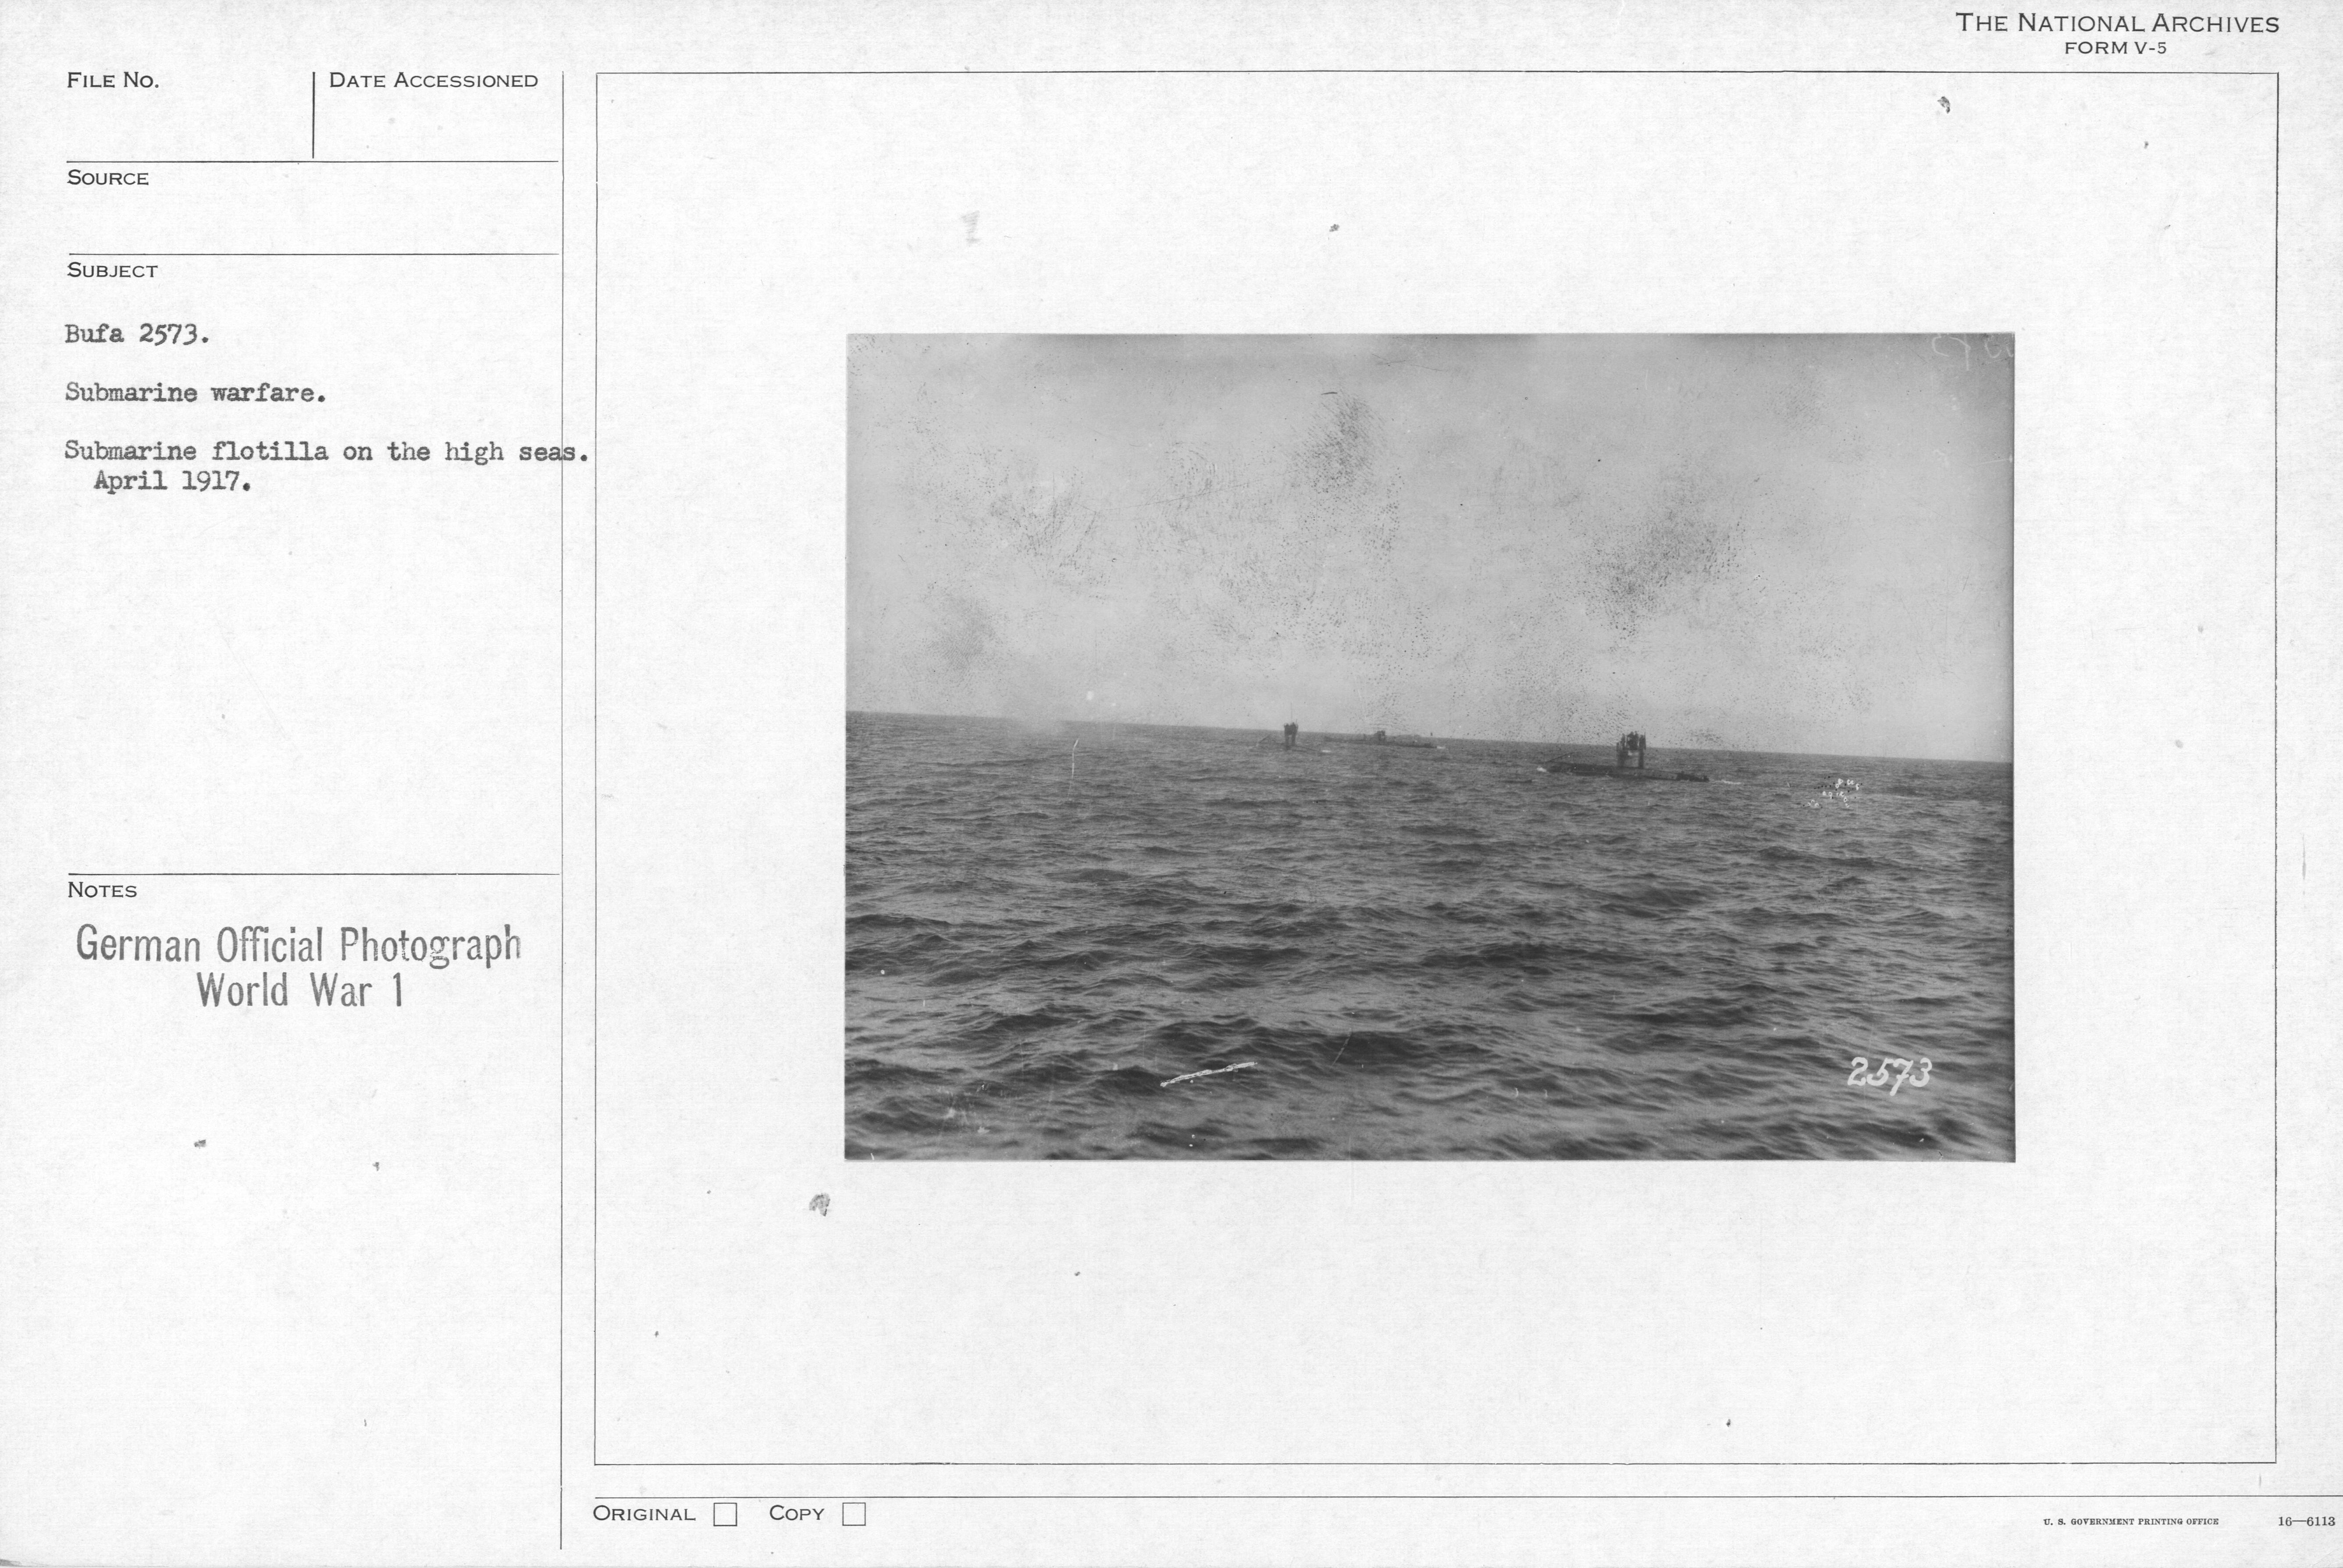 Submarine warfare. Submarine flotilla on the high seas. April 1917